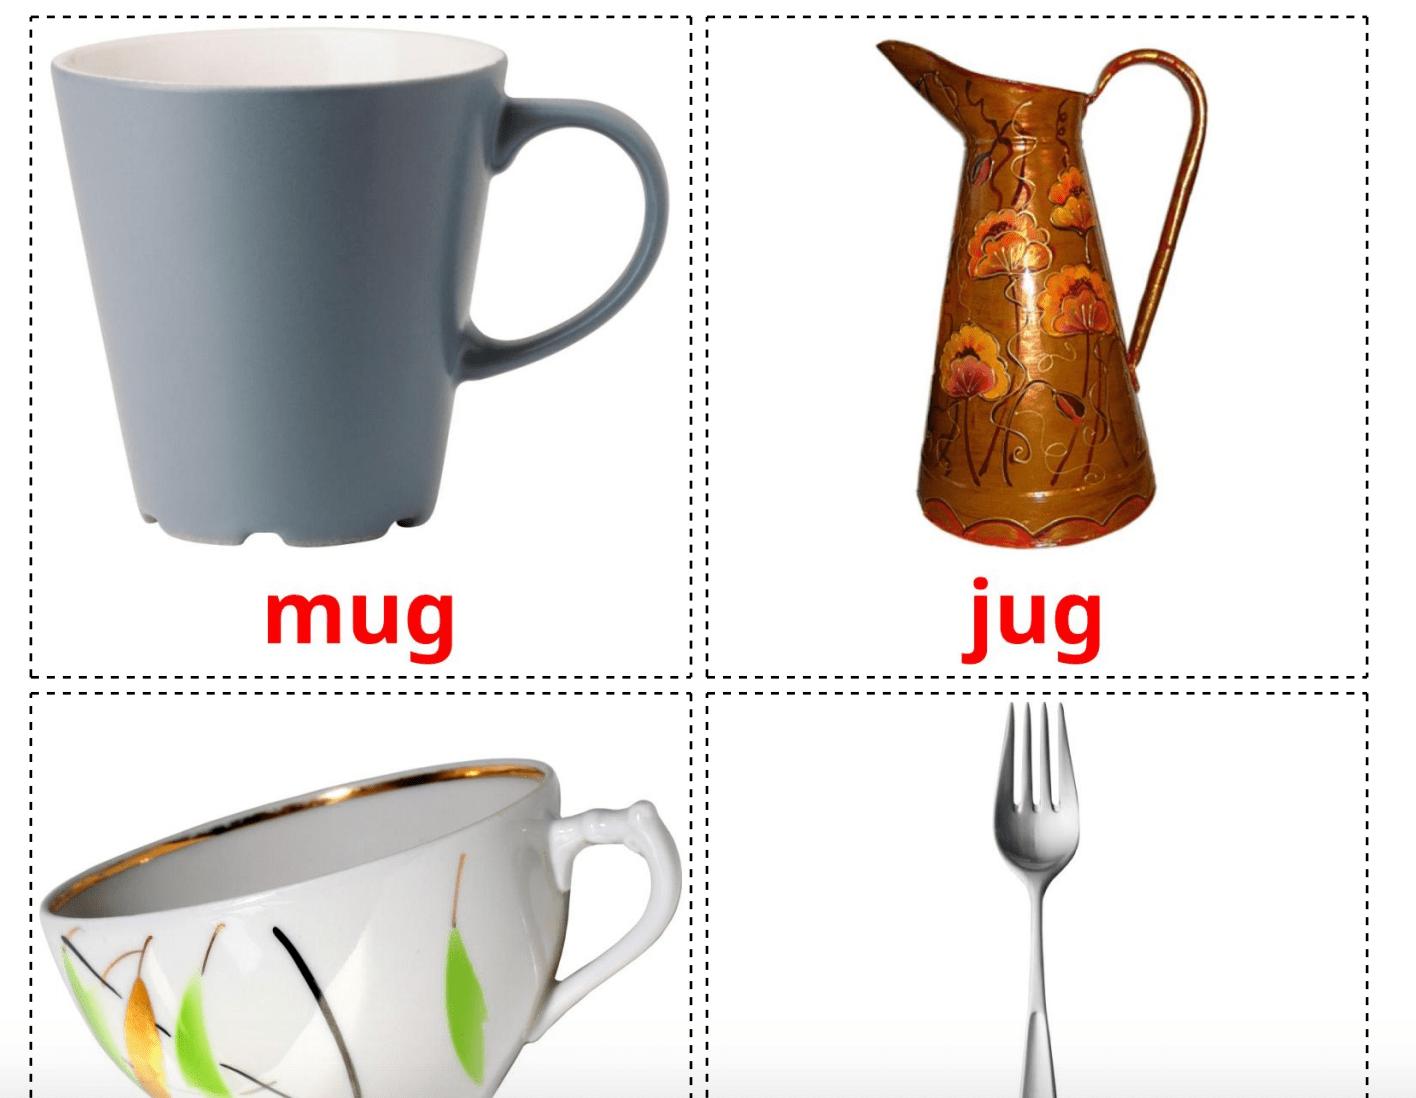 29 Realistic Crockery And Cutlery Flashcards